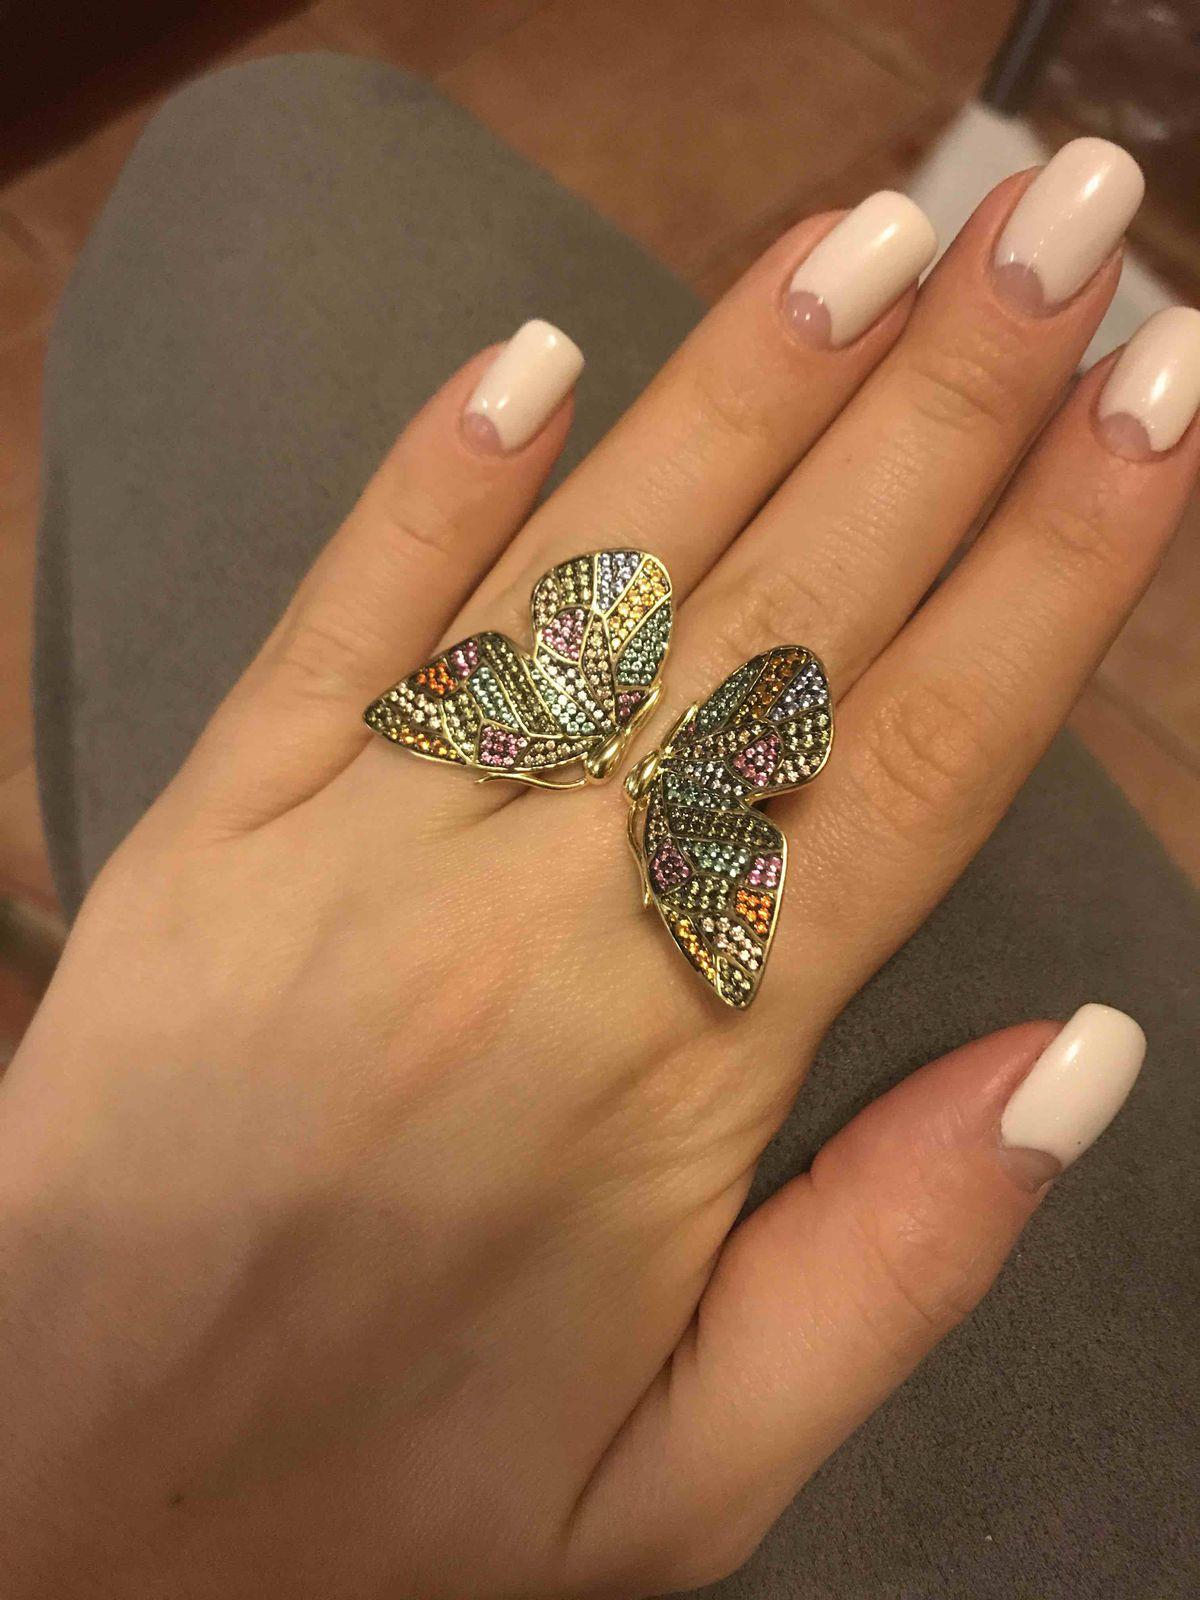 Кольцо - бабочка